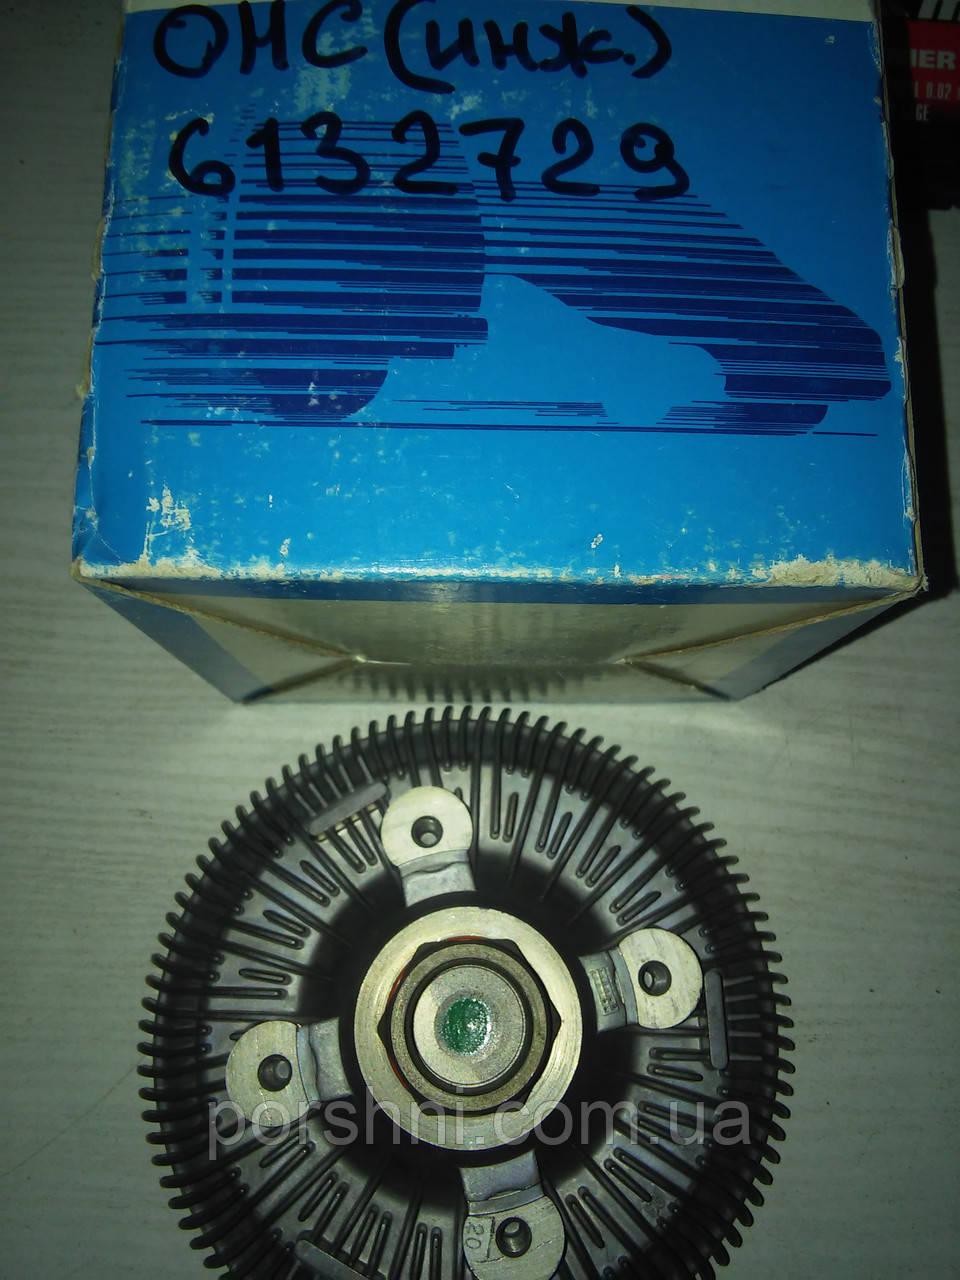 Термомуфта Ford Scorpio Sierra  OHC Инжектор  оригинал 6132729